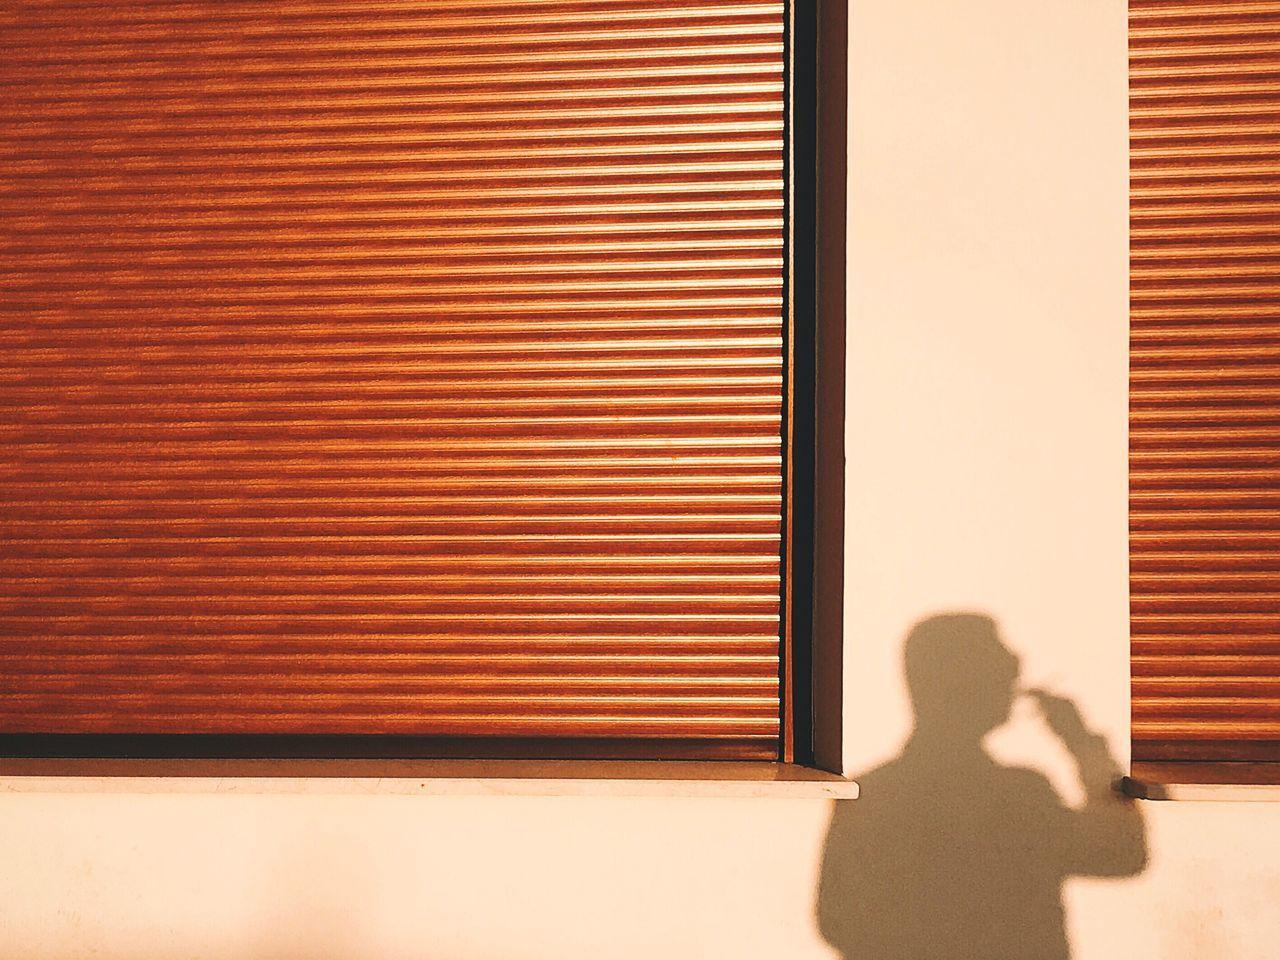 EyeEm People Shadow Shadows & Lights Shadow And Light EyeEm Best Shots EyeEm Gallery EyeEm Best Edits EyeEm Best Shots - Nature EyeEm Team The City Light EyeEmNewHere Urban Geometry Urbanphotography Urban Lifestyle